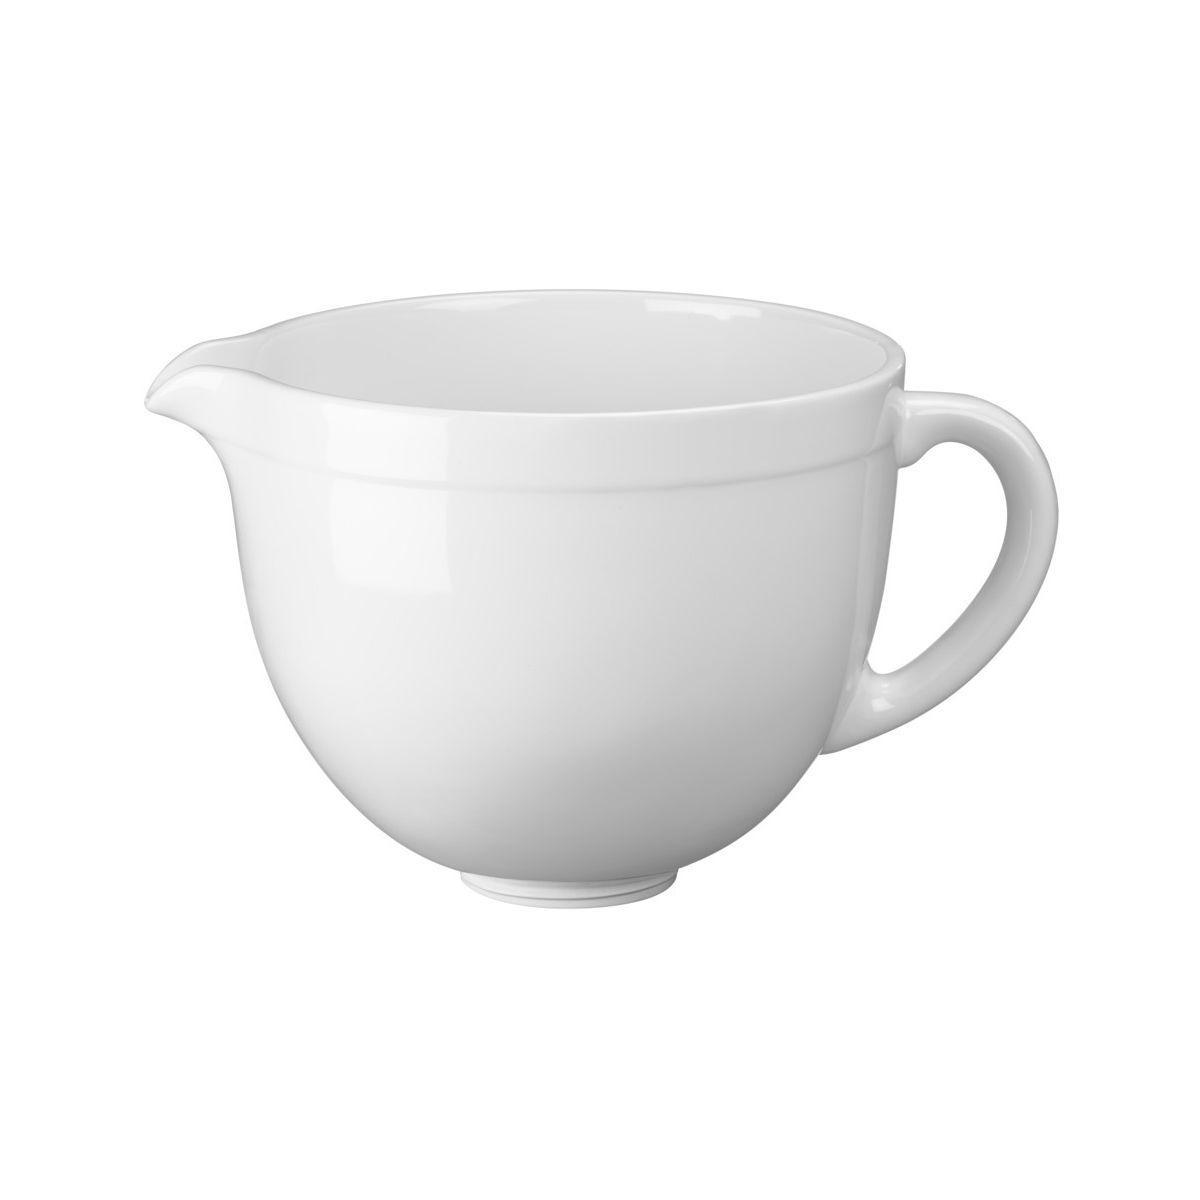 Acc. kitchenaid 5ksmcb5lw bol ceramique - livraison offerte : code livpremium (photo)